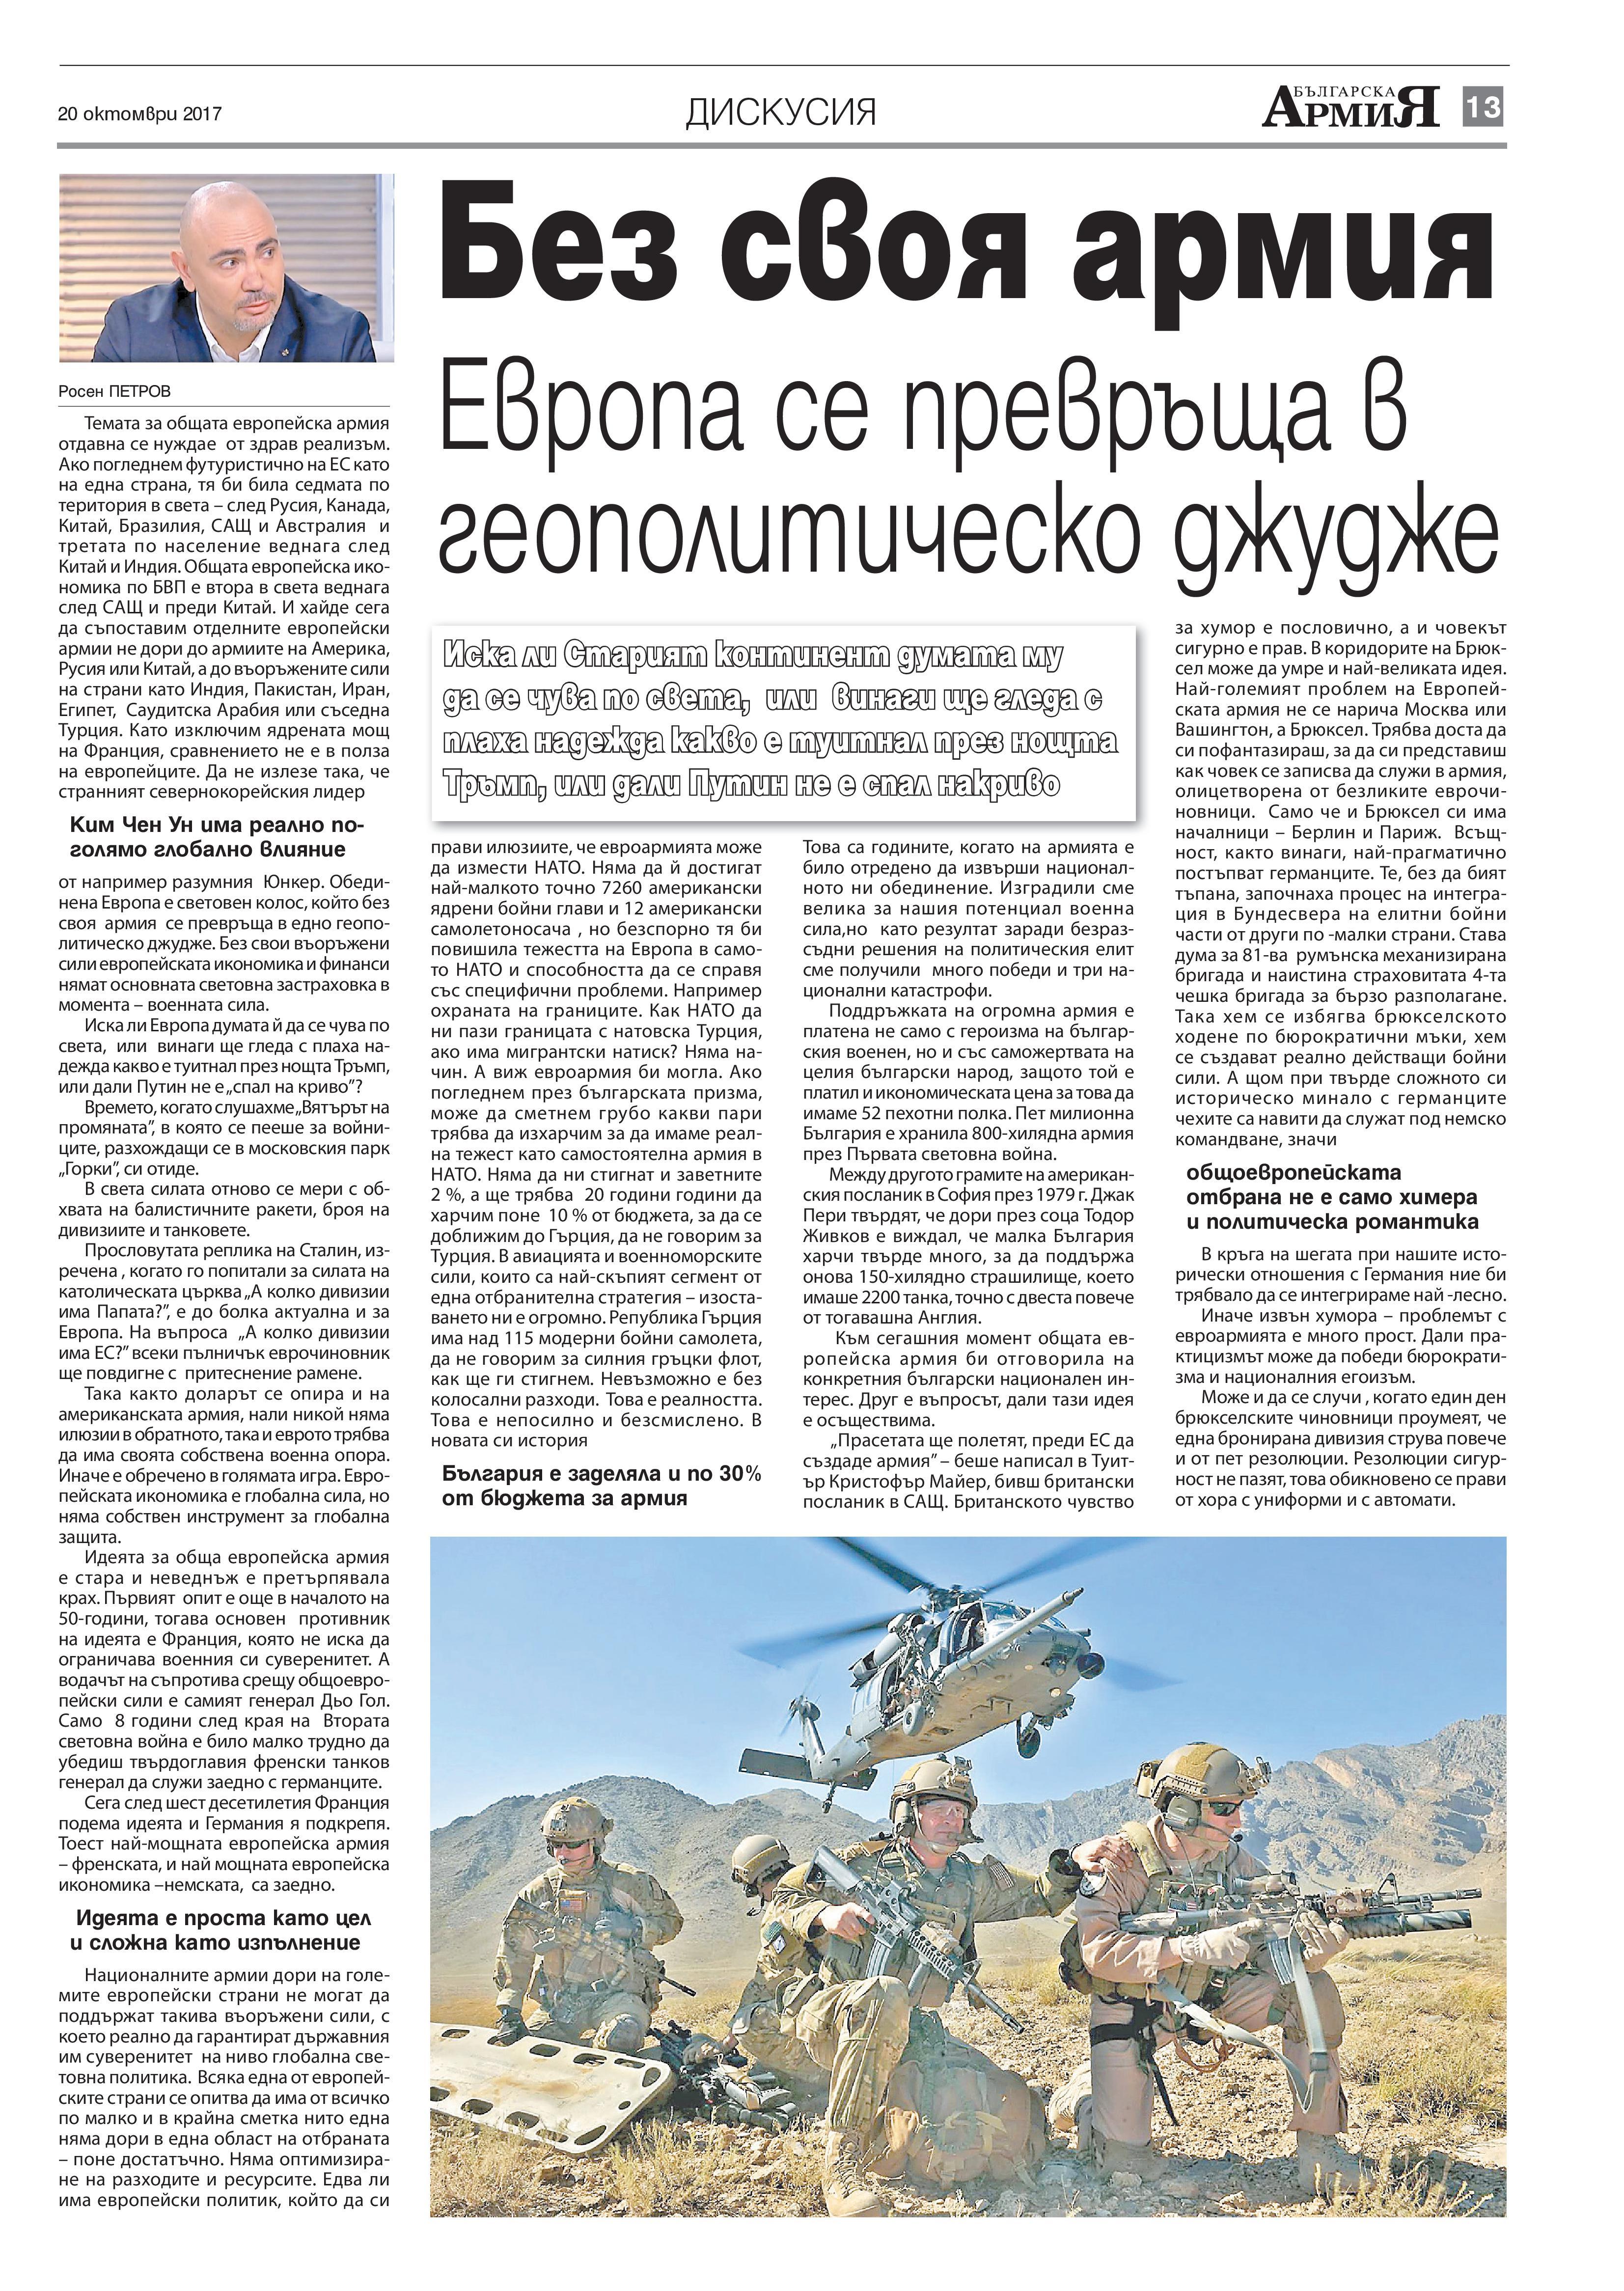 http://armymedia.bg/wp-content/uploads/2015/06/13-8.jpg